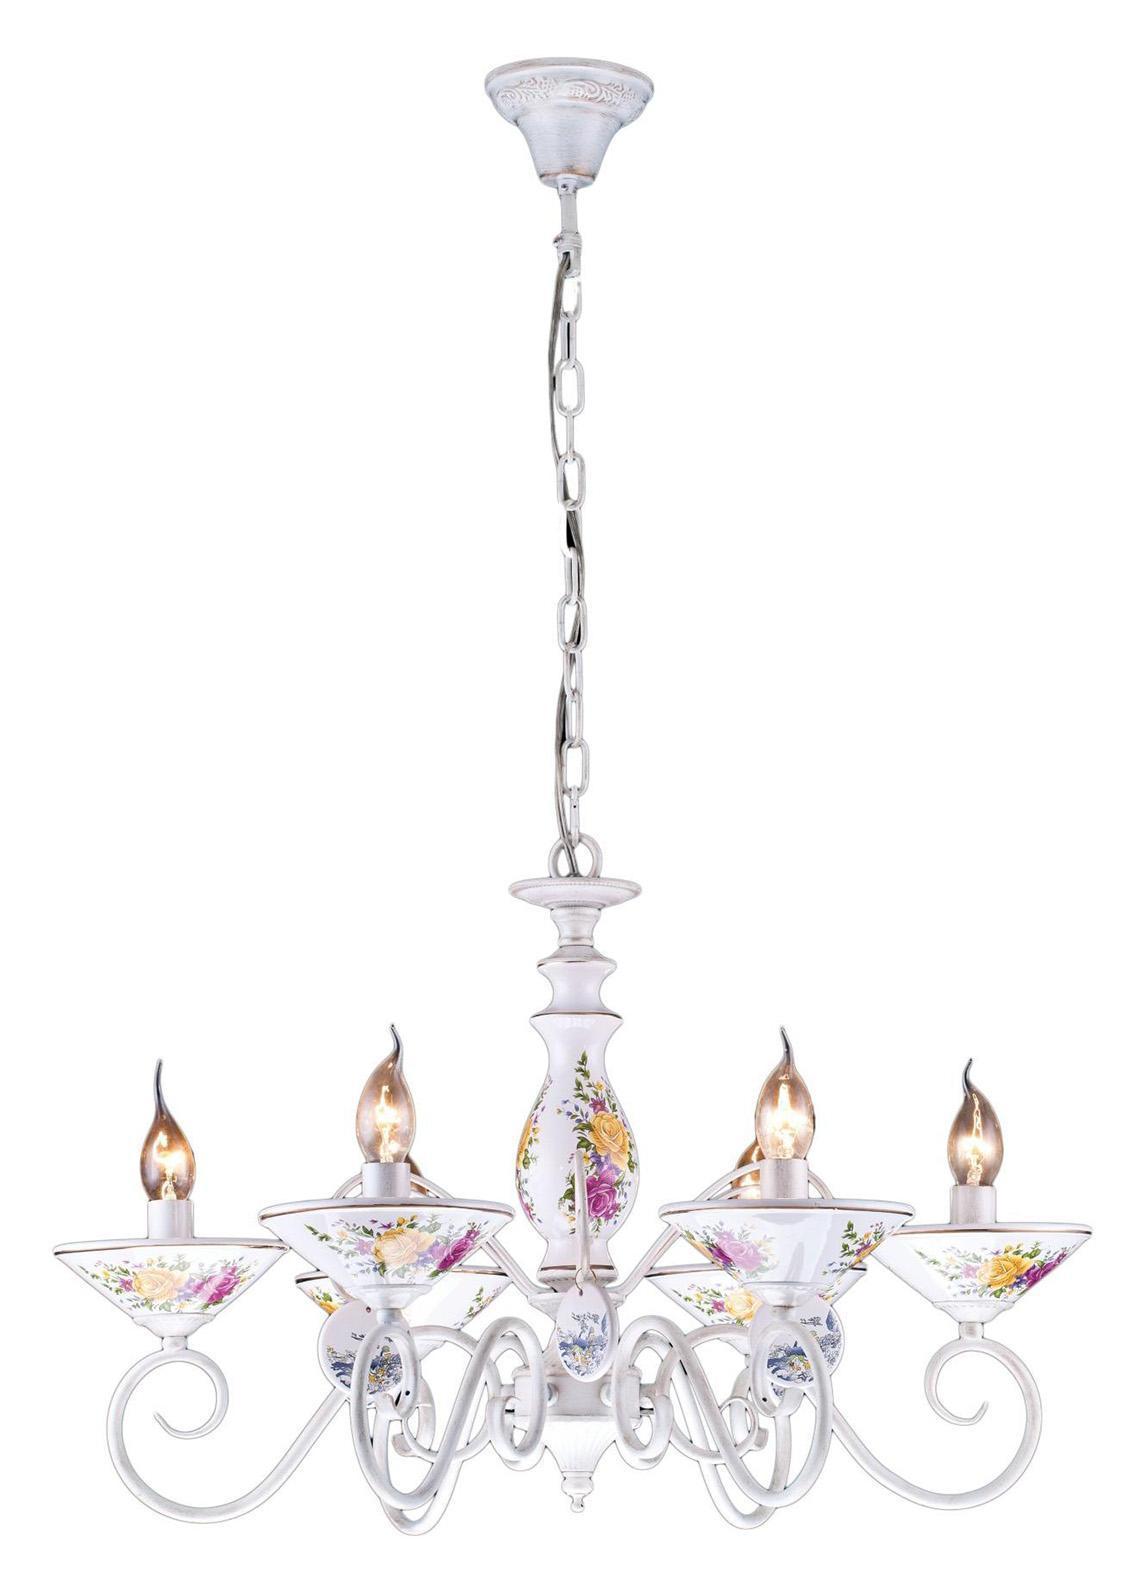 Люстра Arte lamp A2061lm-6wg люстра divinare diana 8111 01 lm 6